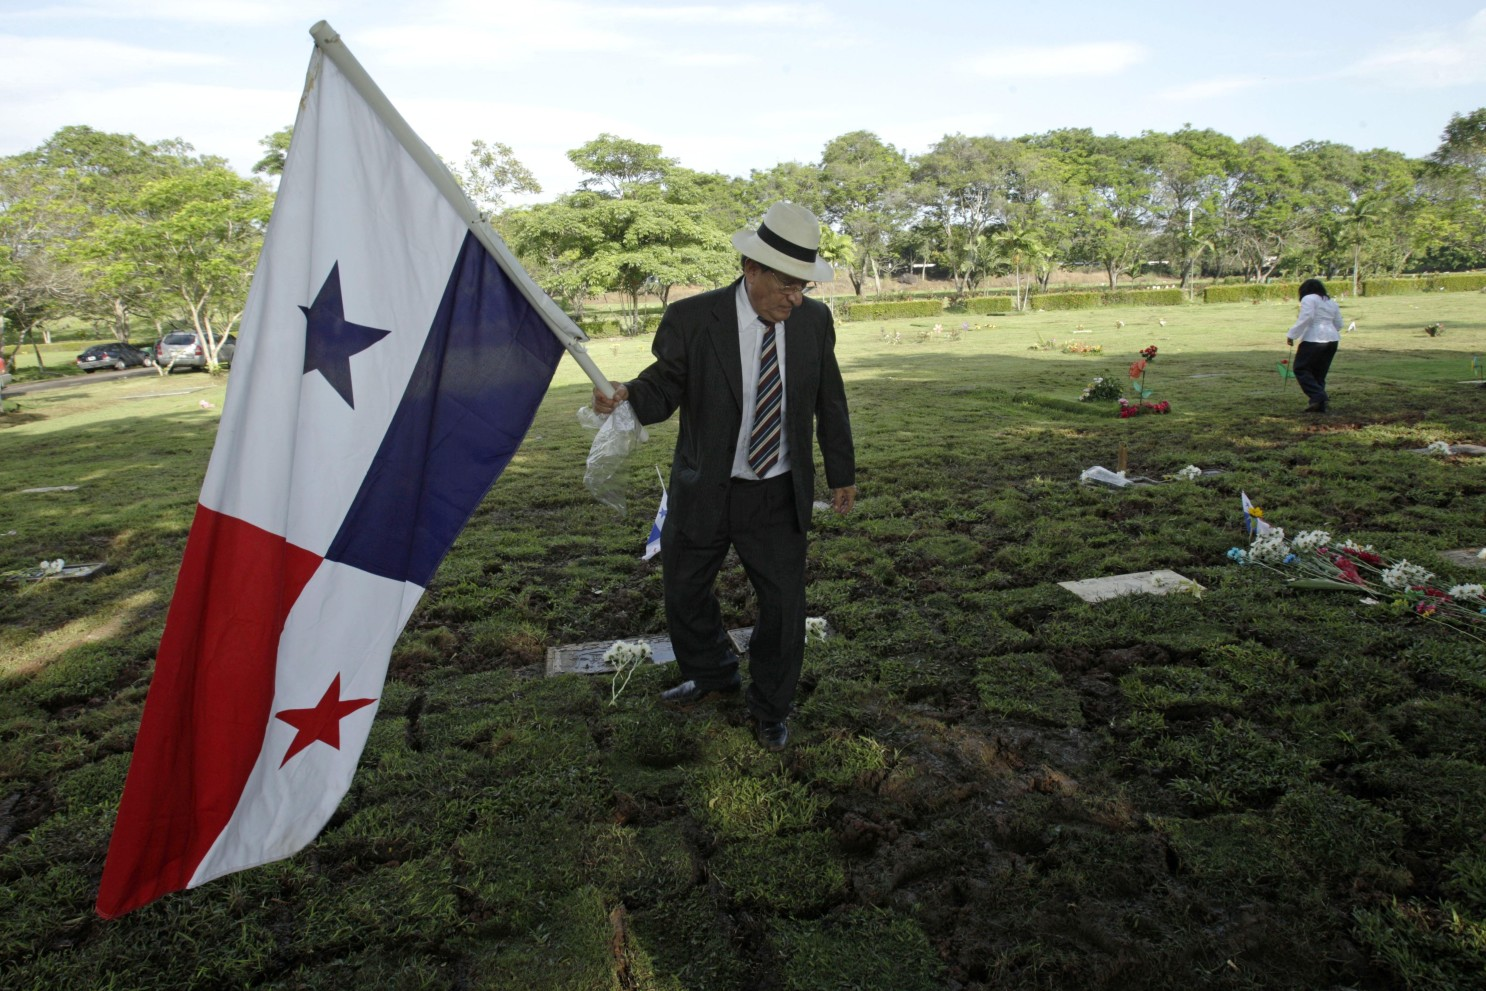 Jardin Service Nouveau Panama Declares Day Of Mourning for Us Invasion Anniversary Of 45 Nouveau Jardin Service